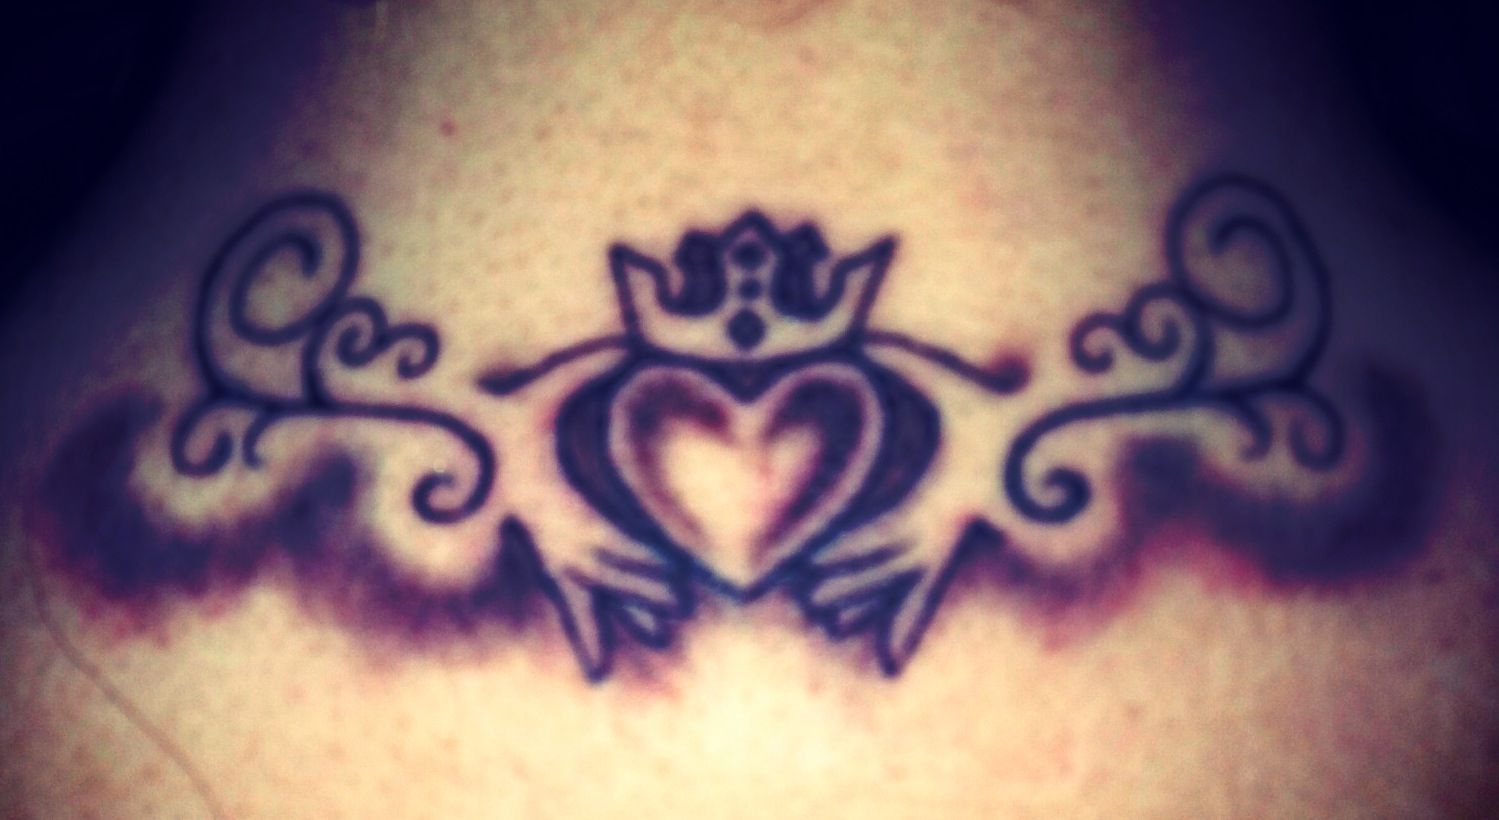 Claddagh Tattoo. Meaning Love Loyalty Friendship